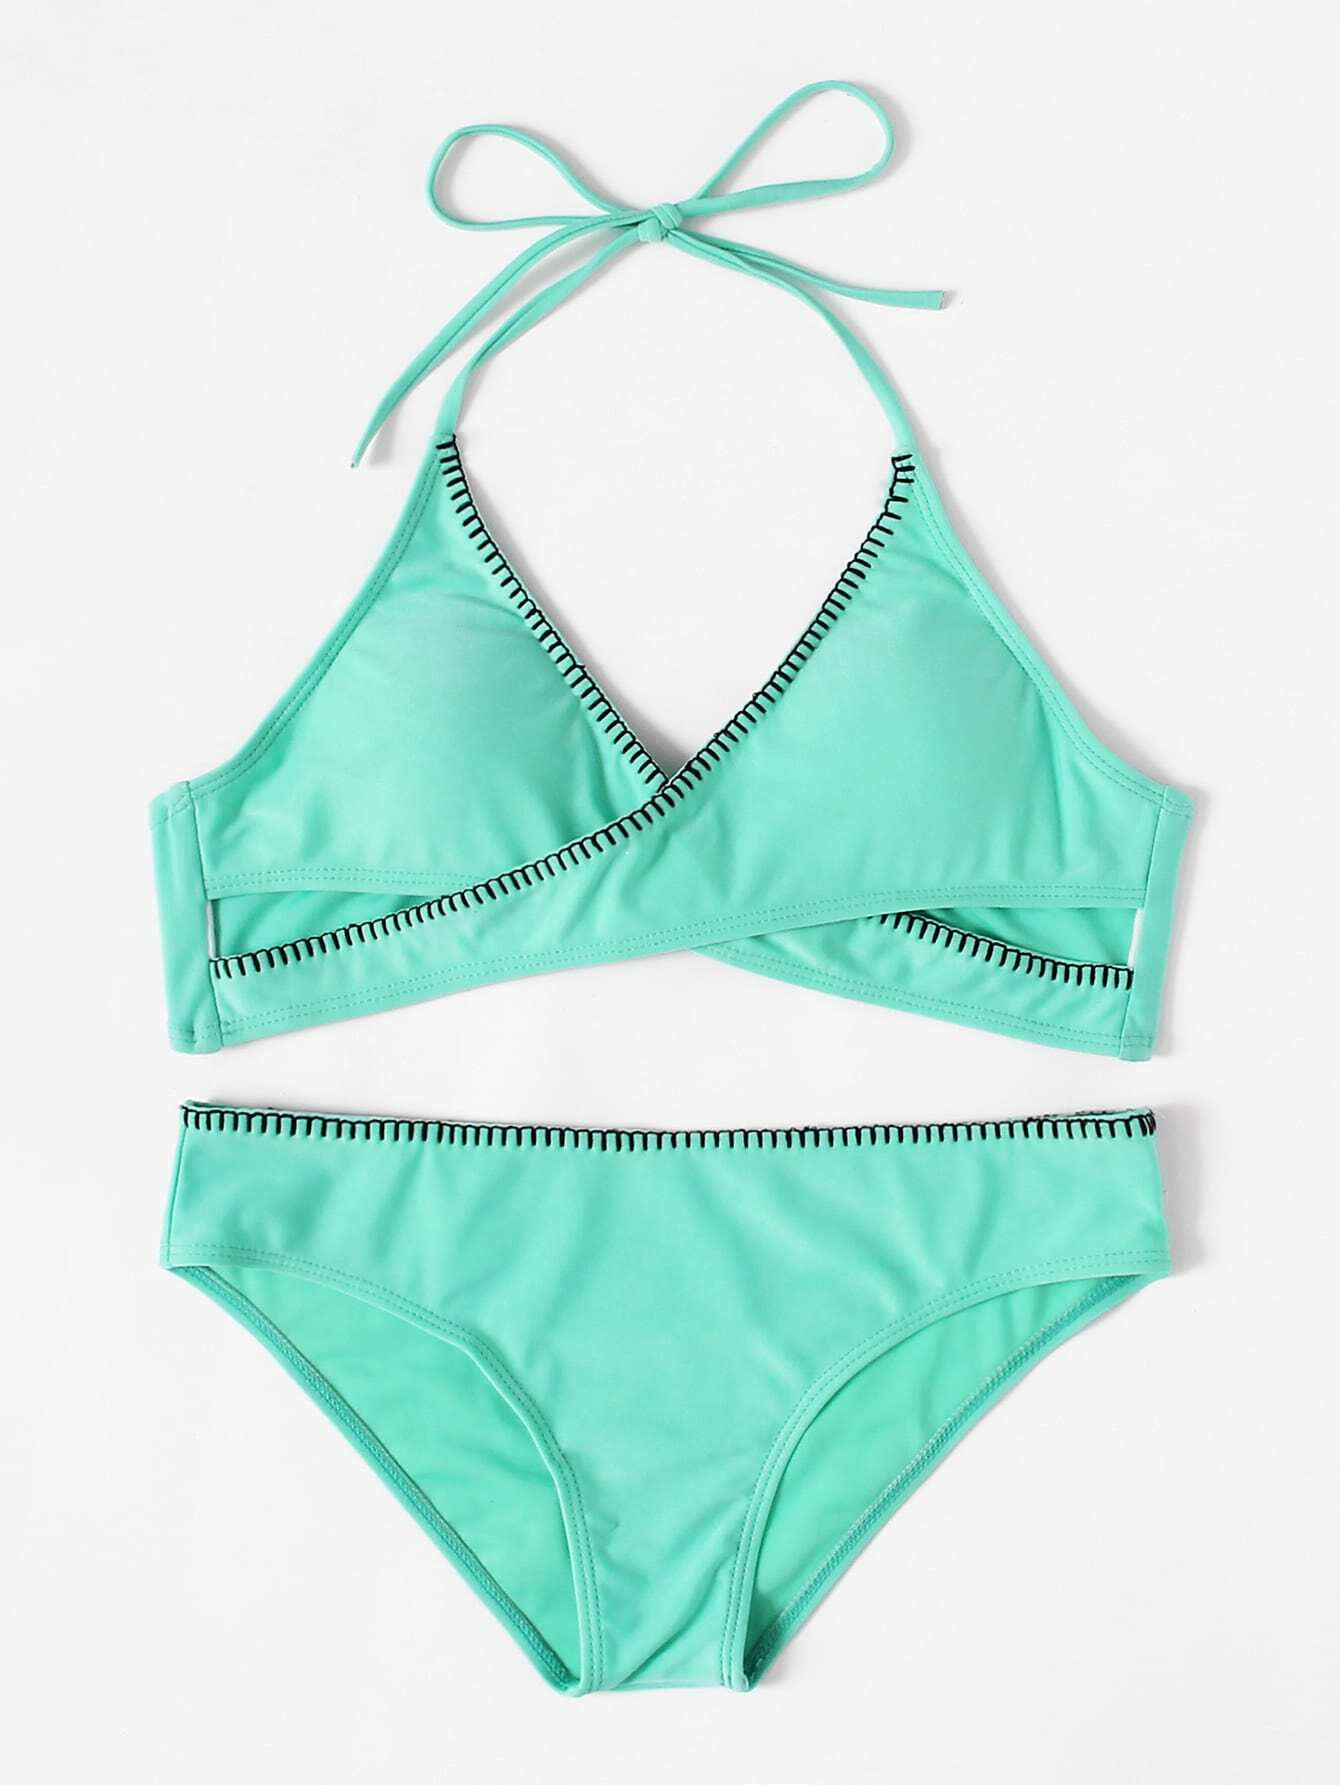 Knot Back Wrap Halter Bikini Set knot back wrap halter bikini set